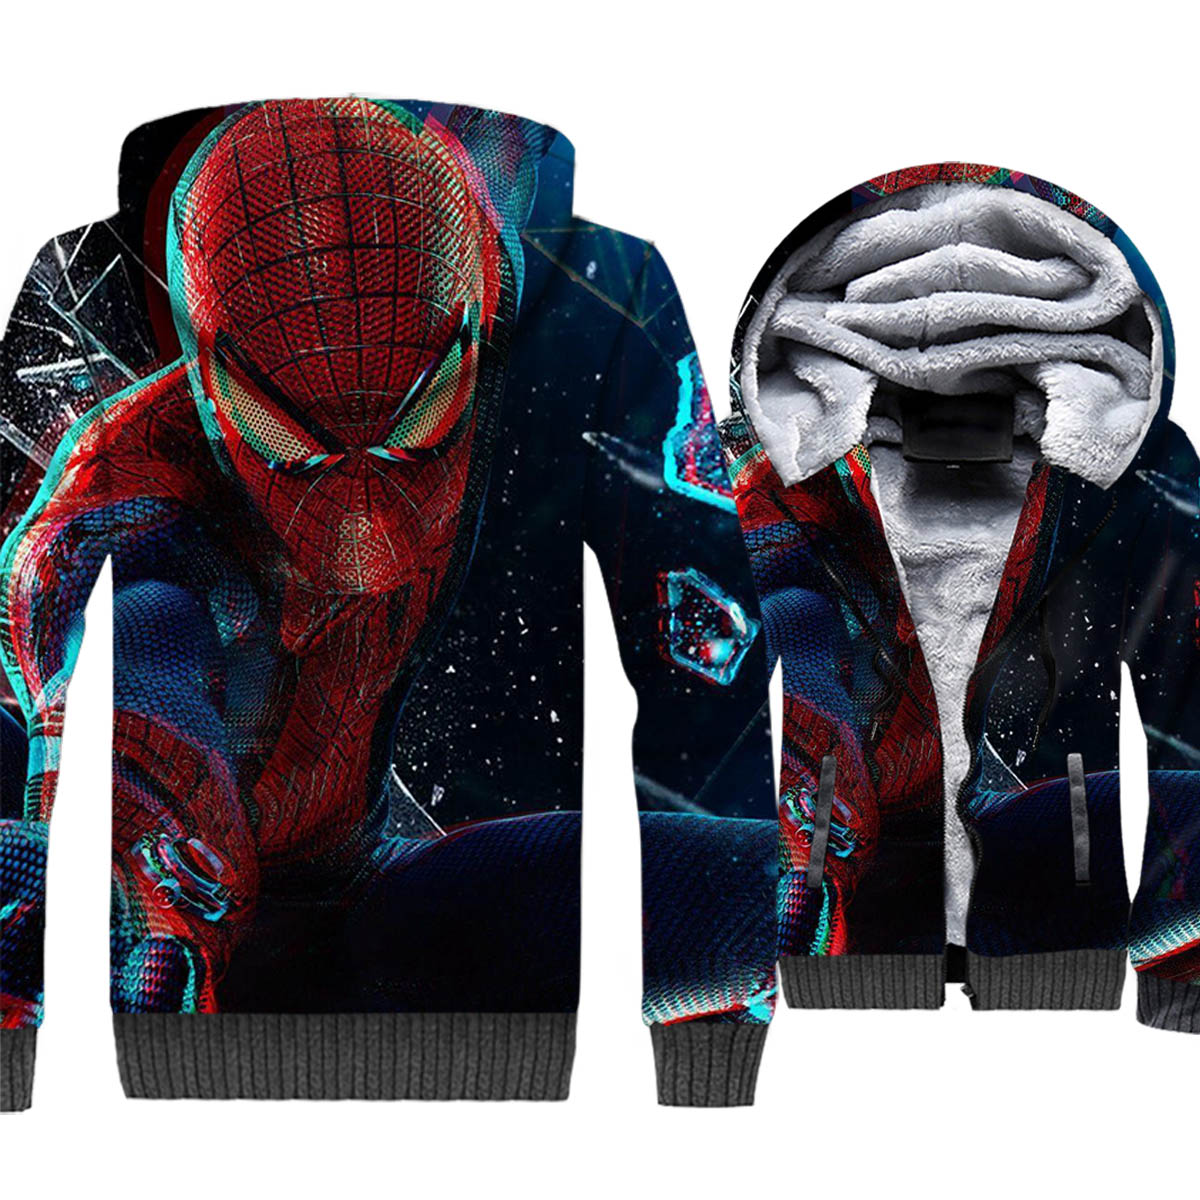 Spiderman Super Hero Sweatshirt Male 2018 Autumn Thick Coats Winter Jackets Men Hoodies 3D Printed Clothing Hip Hop Men's Hoodie